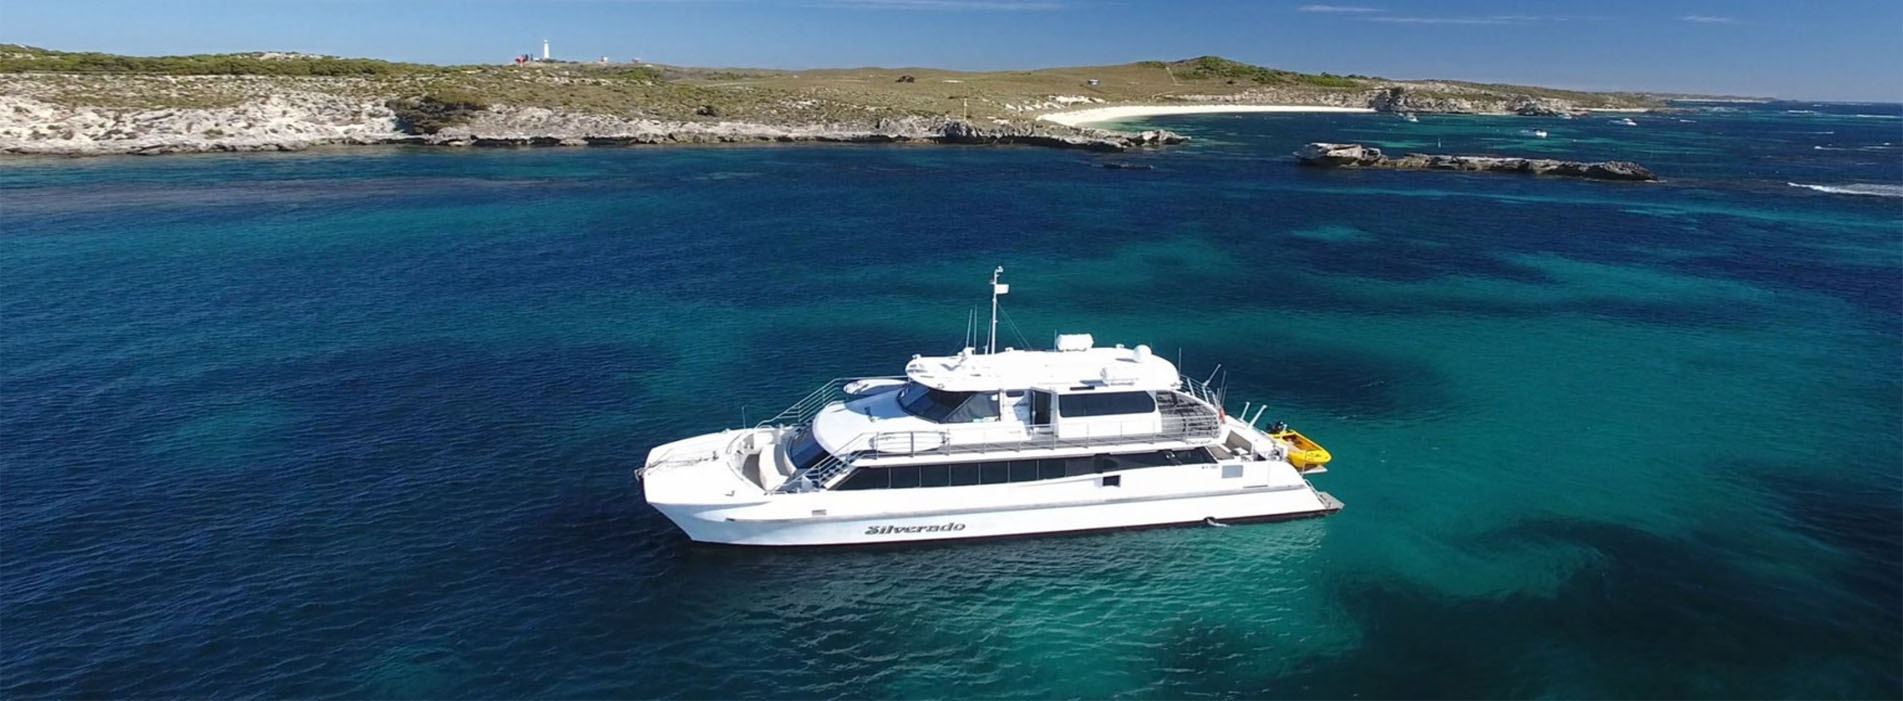 SILVERADO boat charters Rottnest Island drone photos